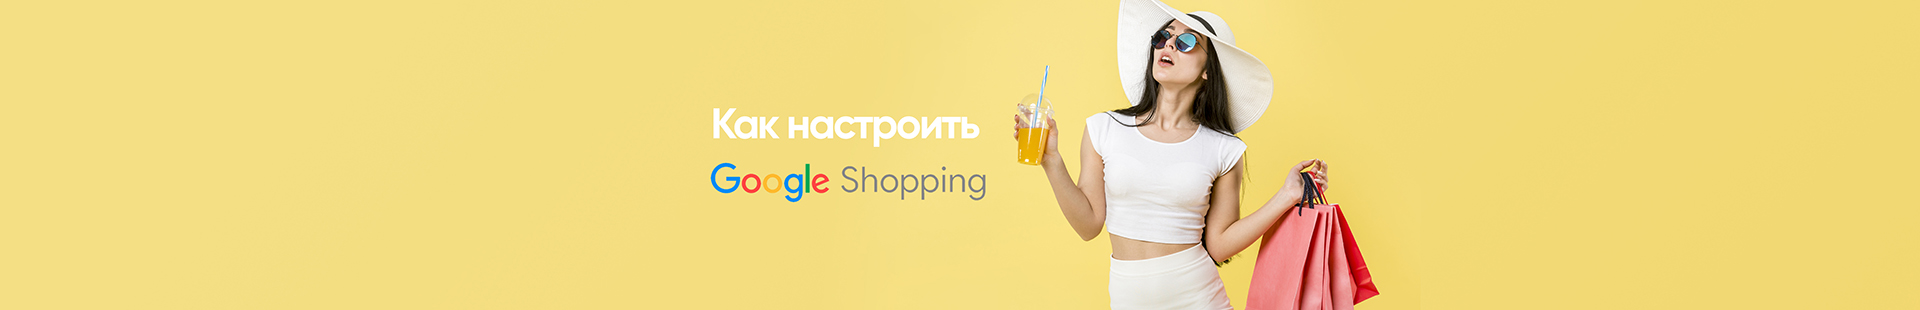 Настройка Google Shopping - пошаговое руководство